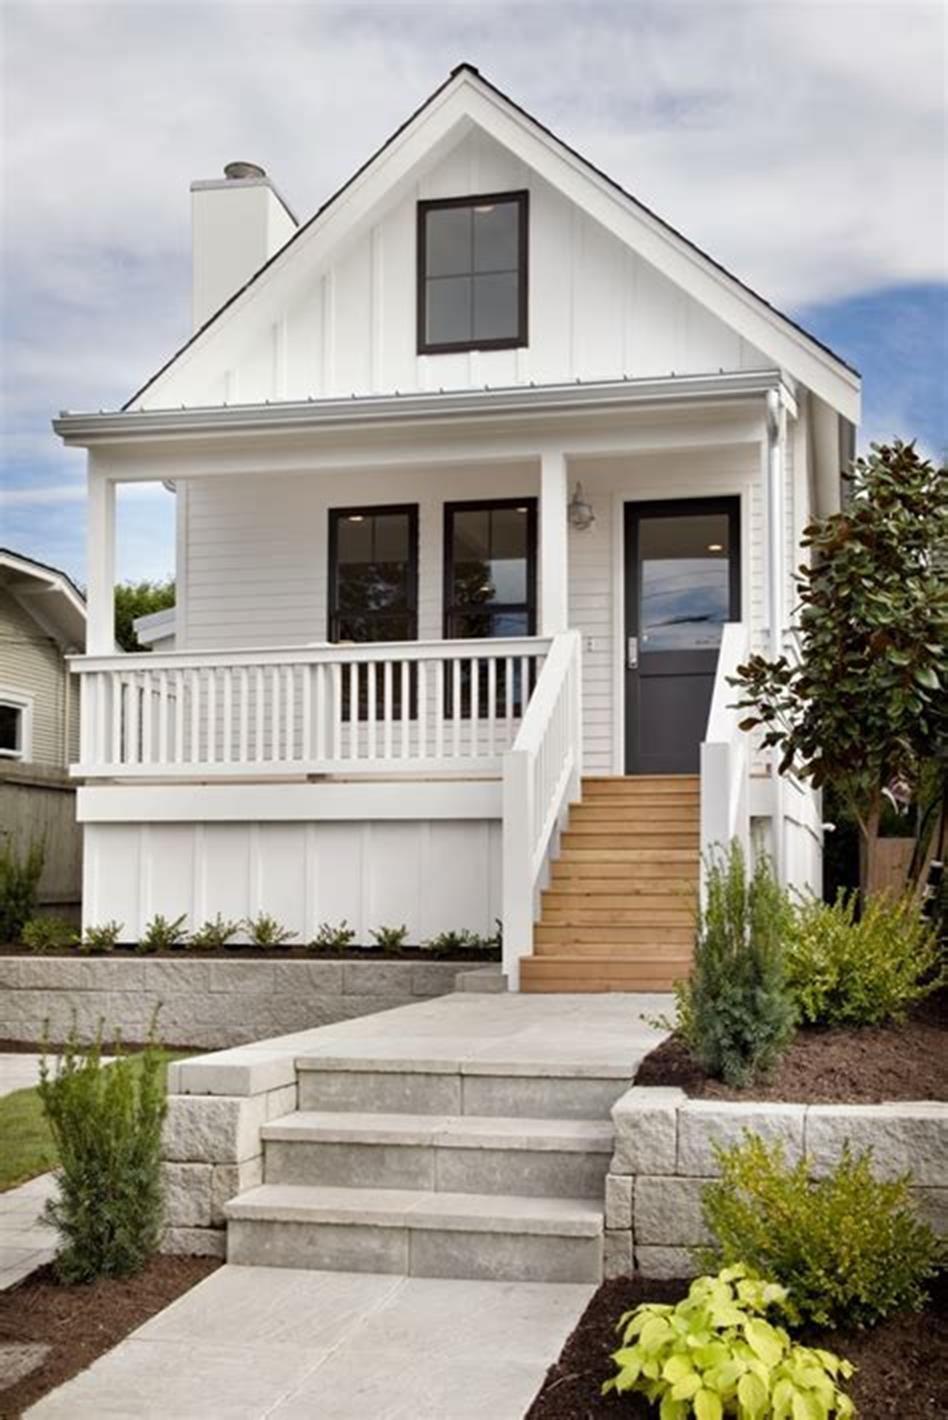 21 Best Modern Farmhouse Exterior Design Ideas Modern Farmhouse Exterior Cottage Exterior Small Cottage Homes